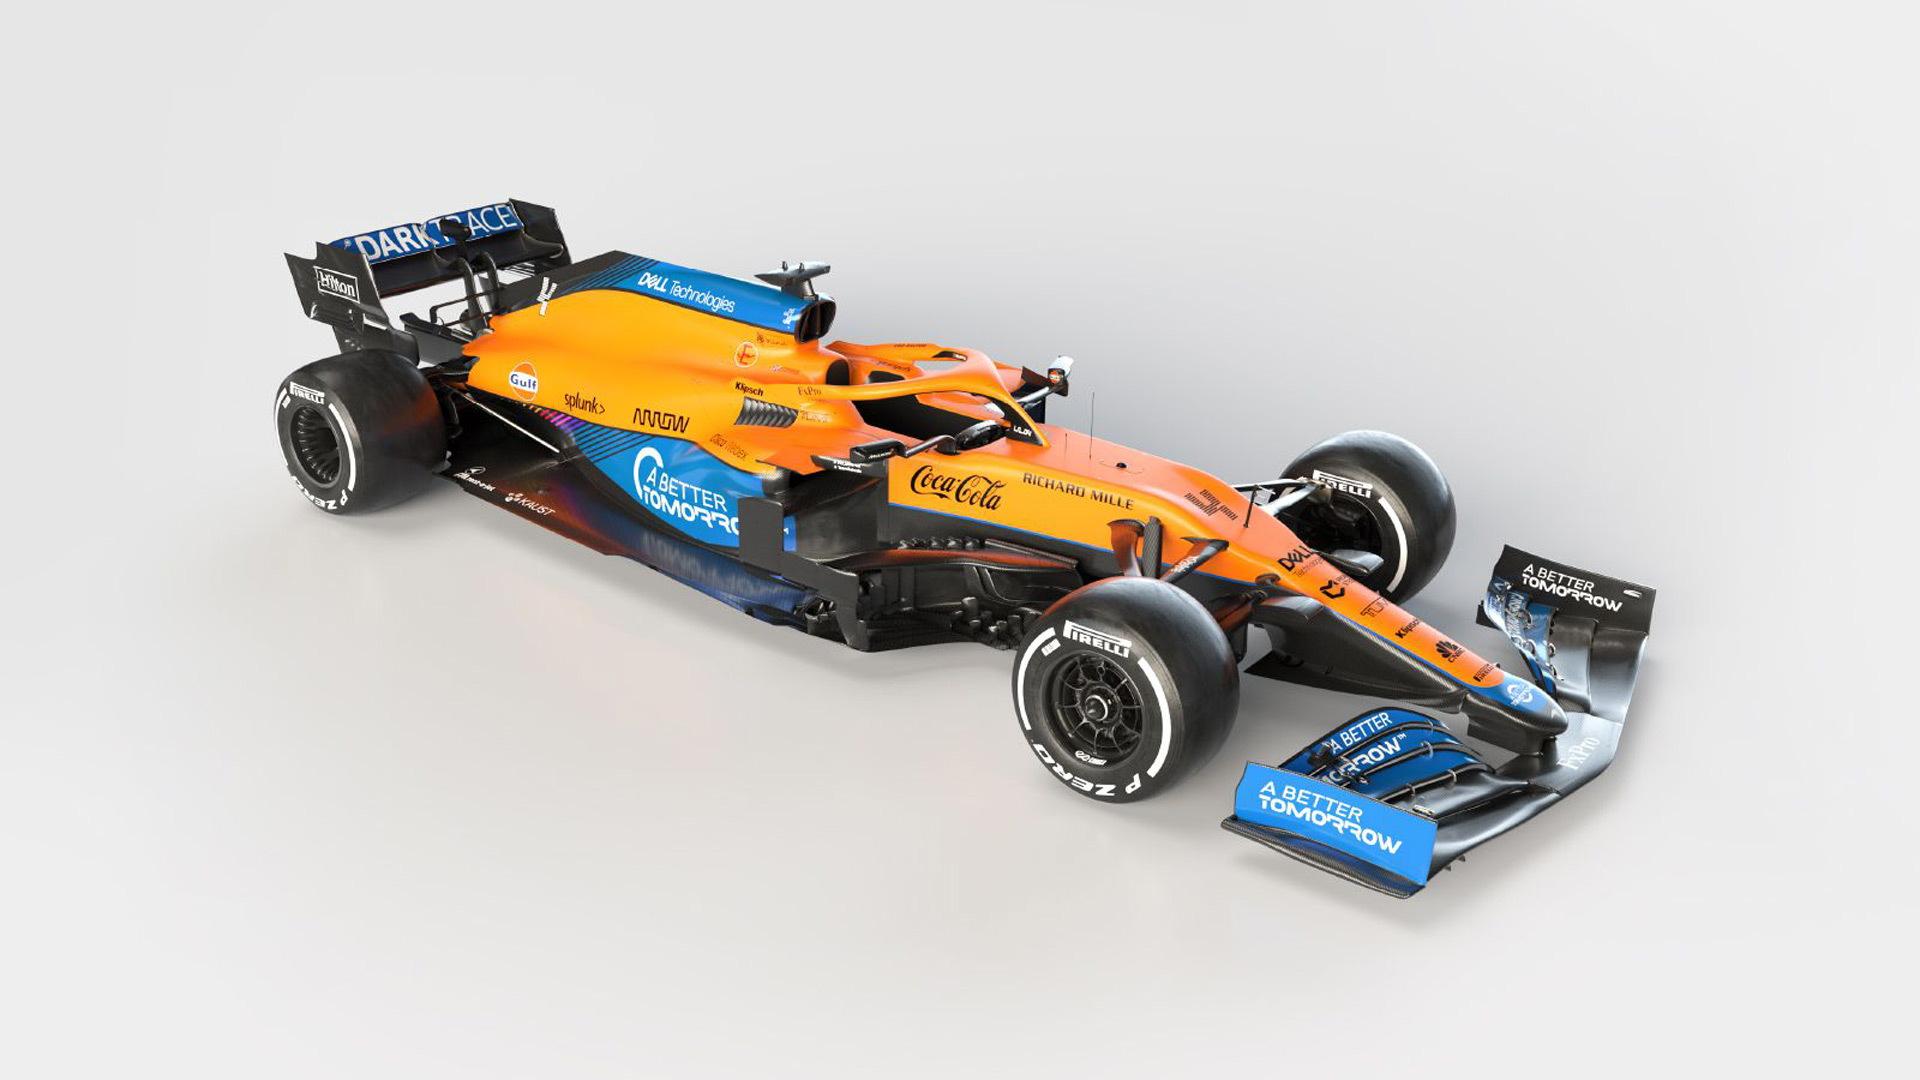 2021 McLaren MCL35M Formula One race car